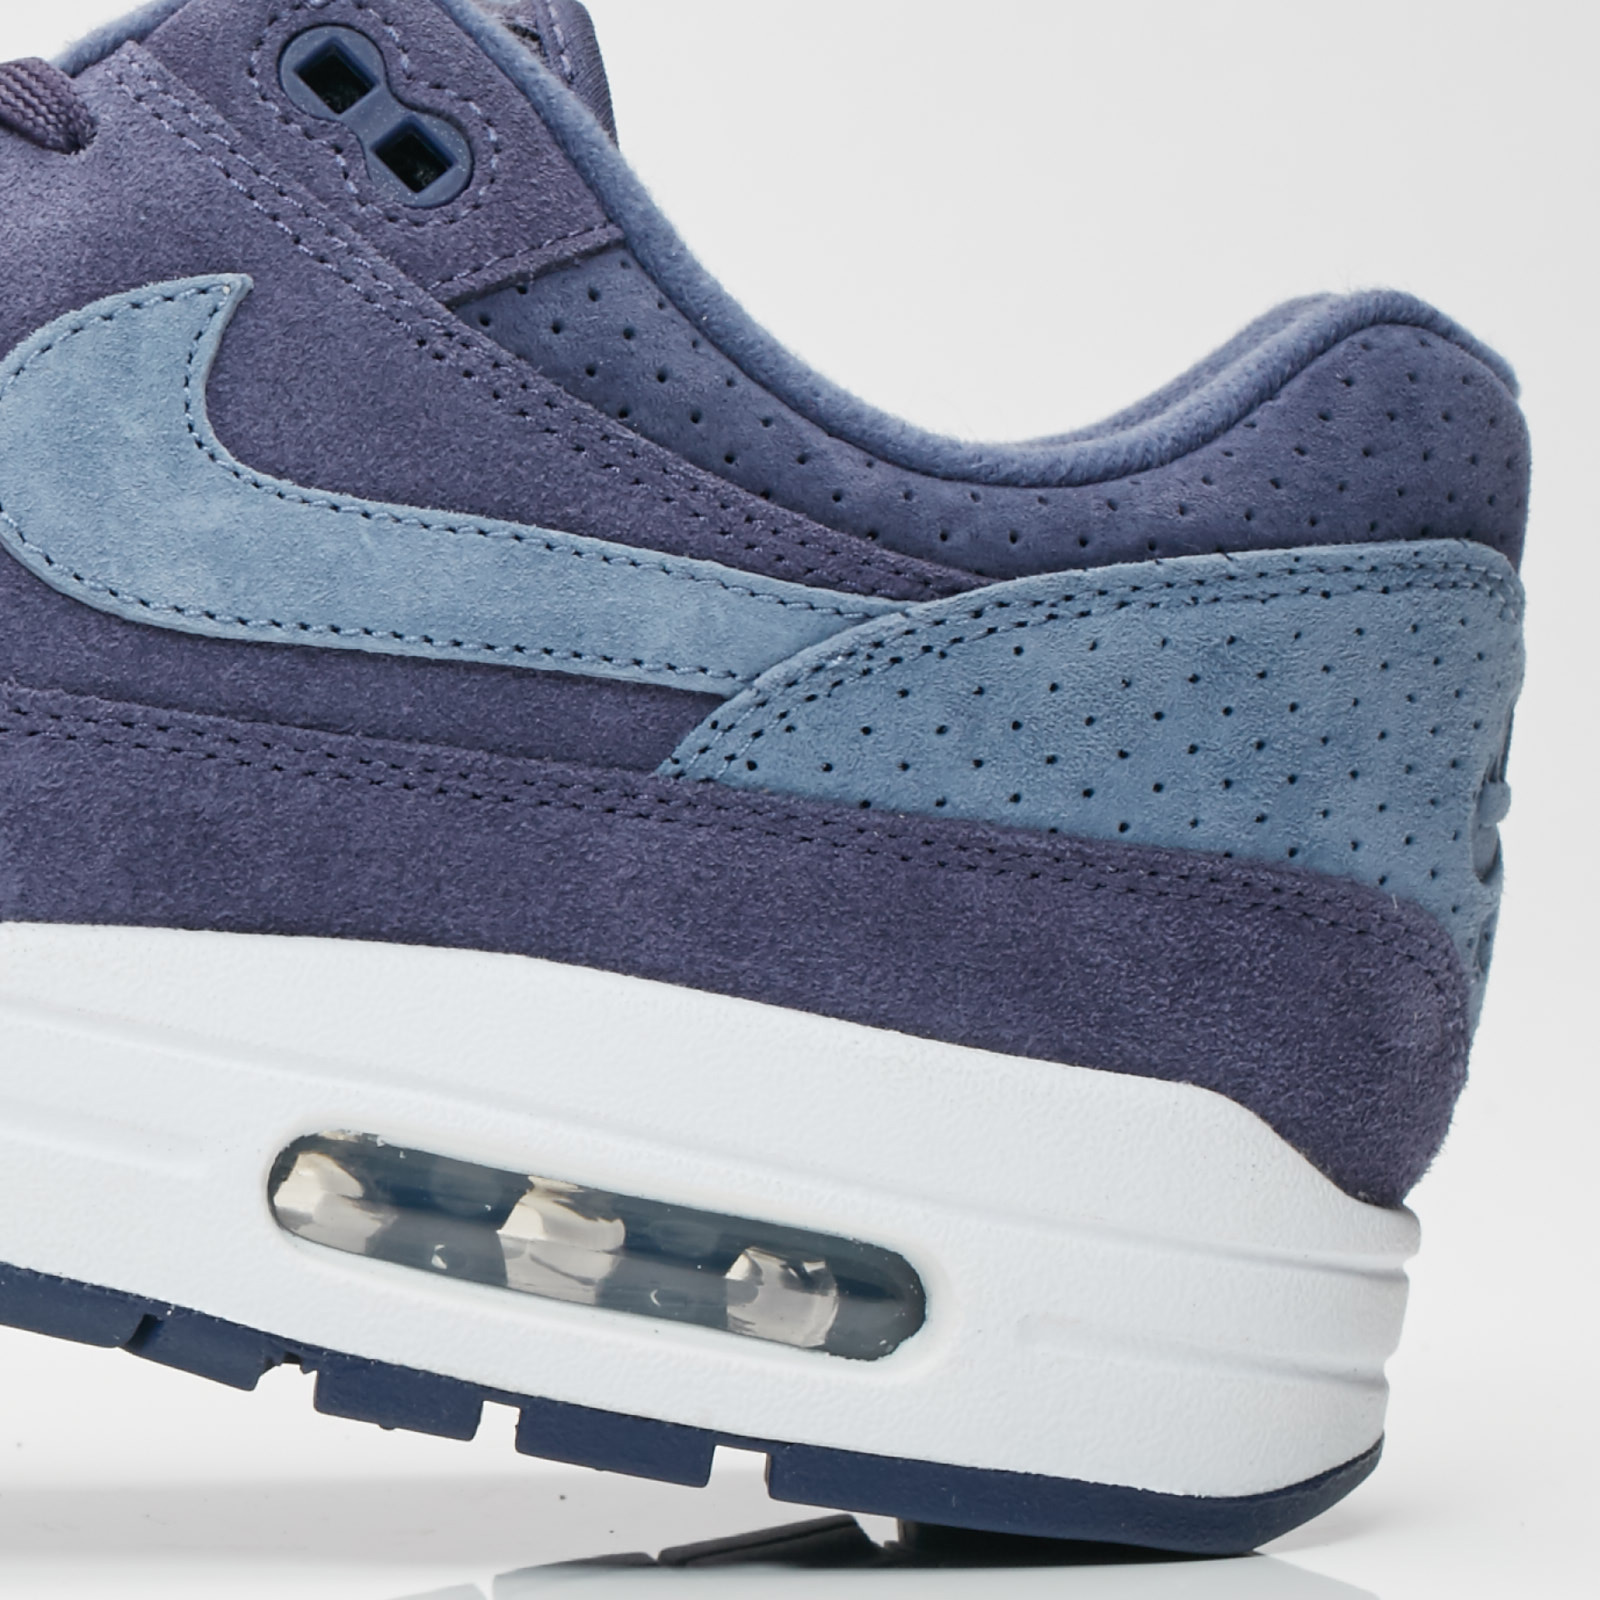 buy online c4965 da136 Nike Sportswear Air Max 1 Premium - 6. Close